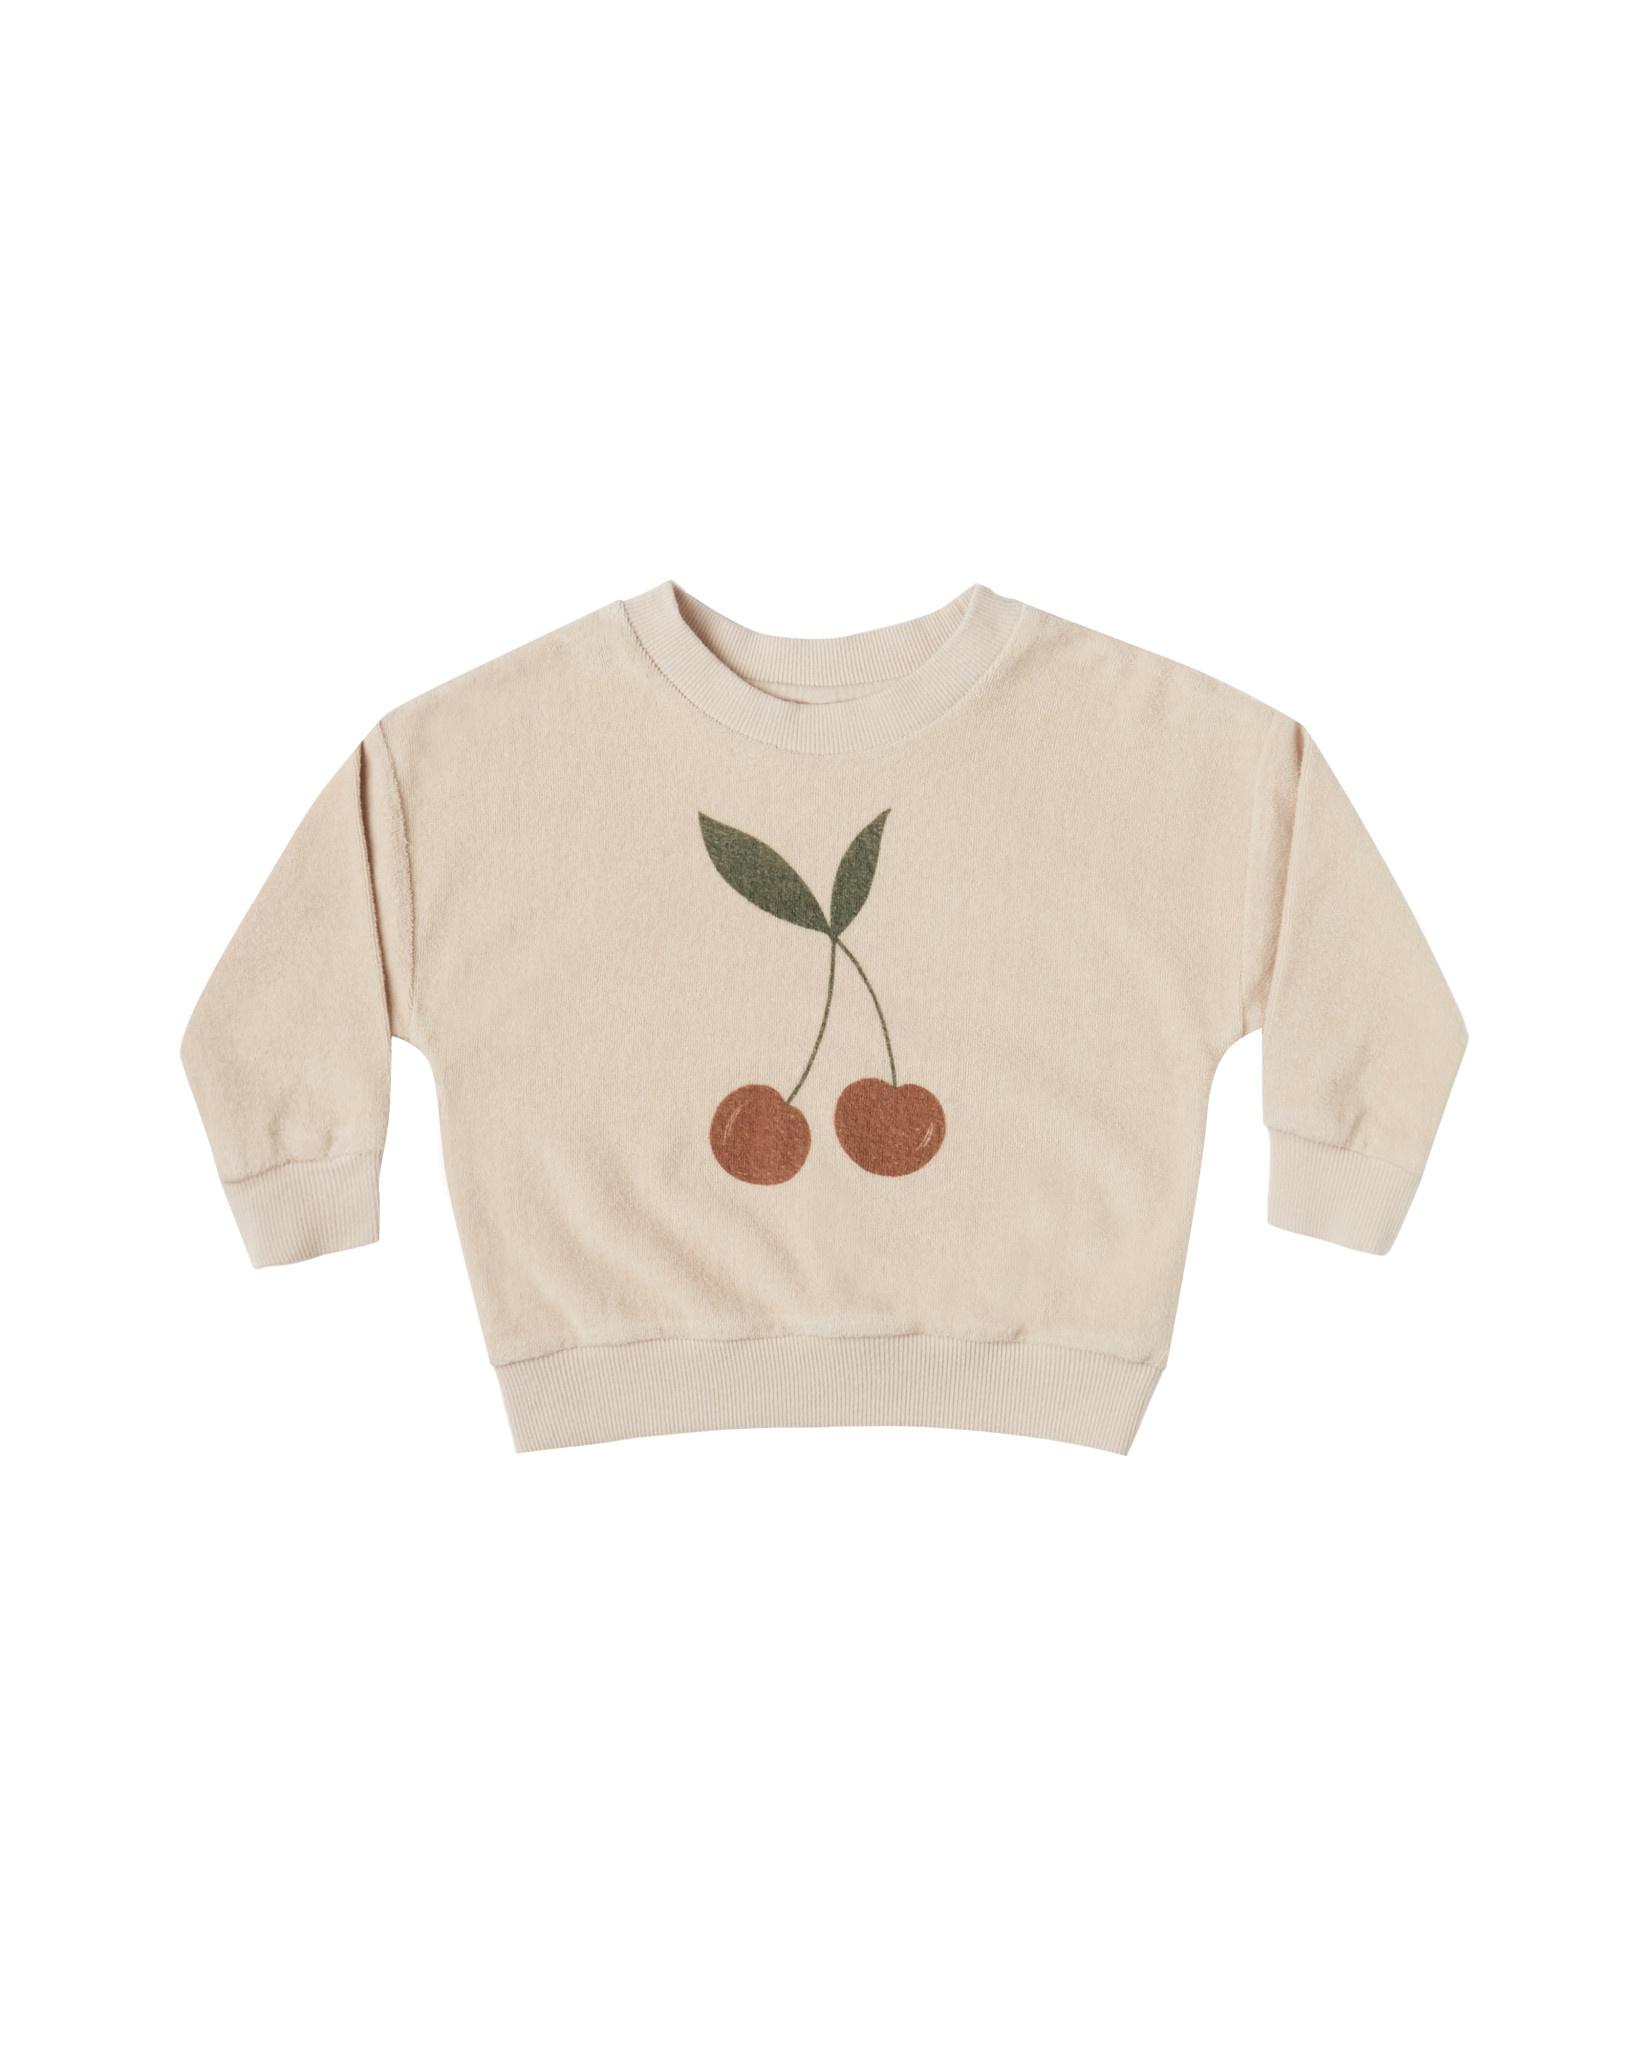 Rylee & Cru Cherry Sweatshirt